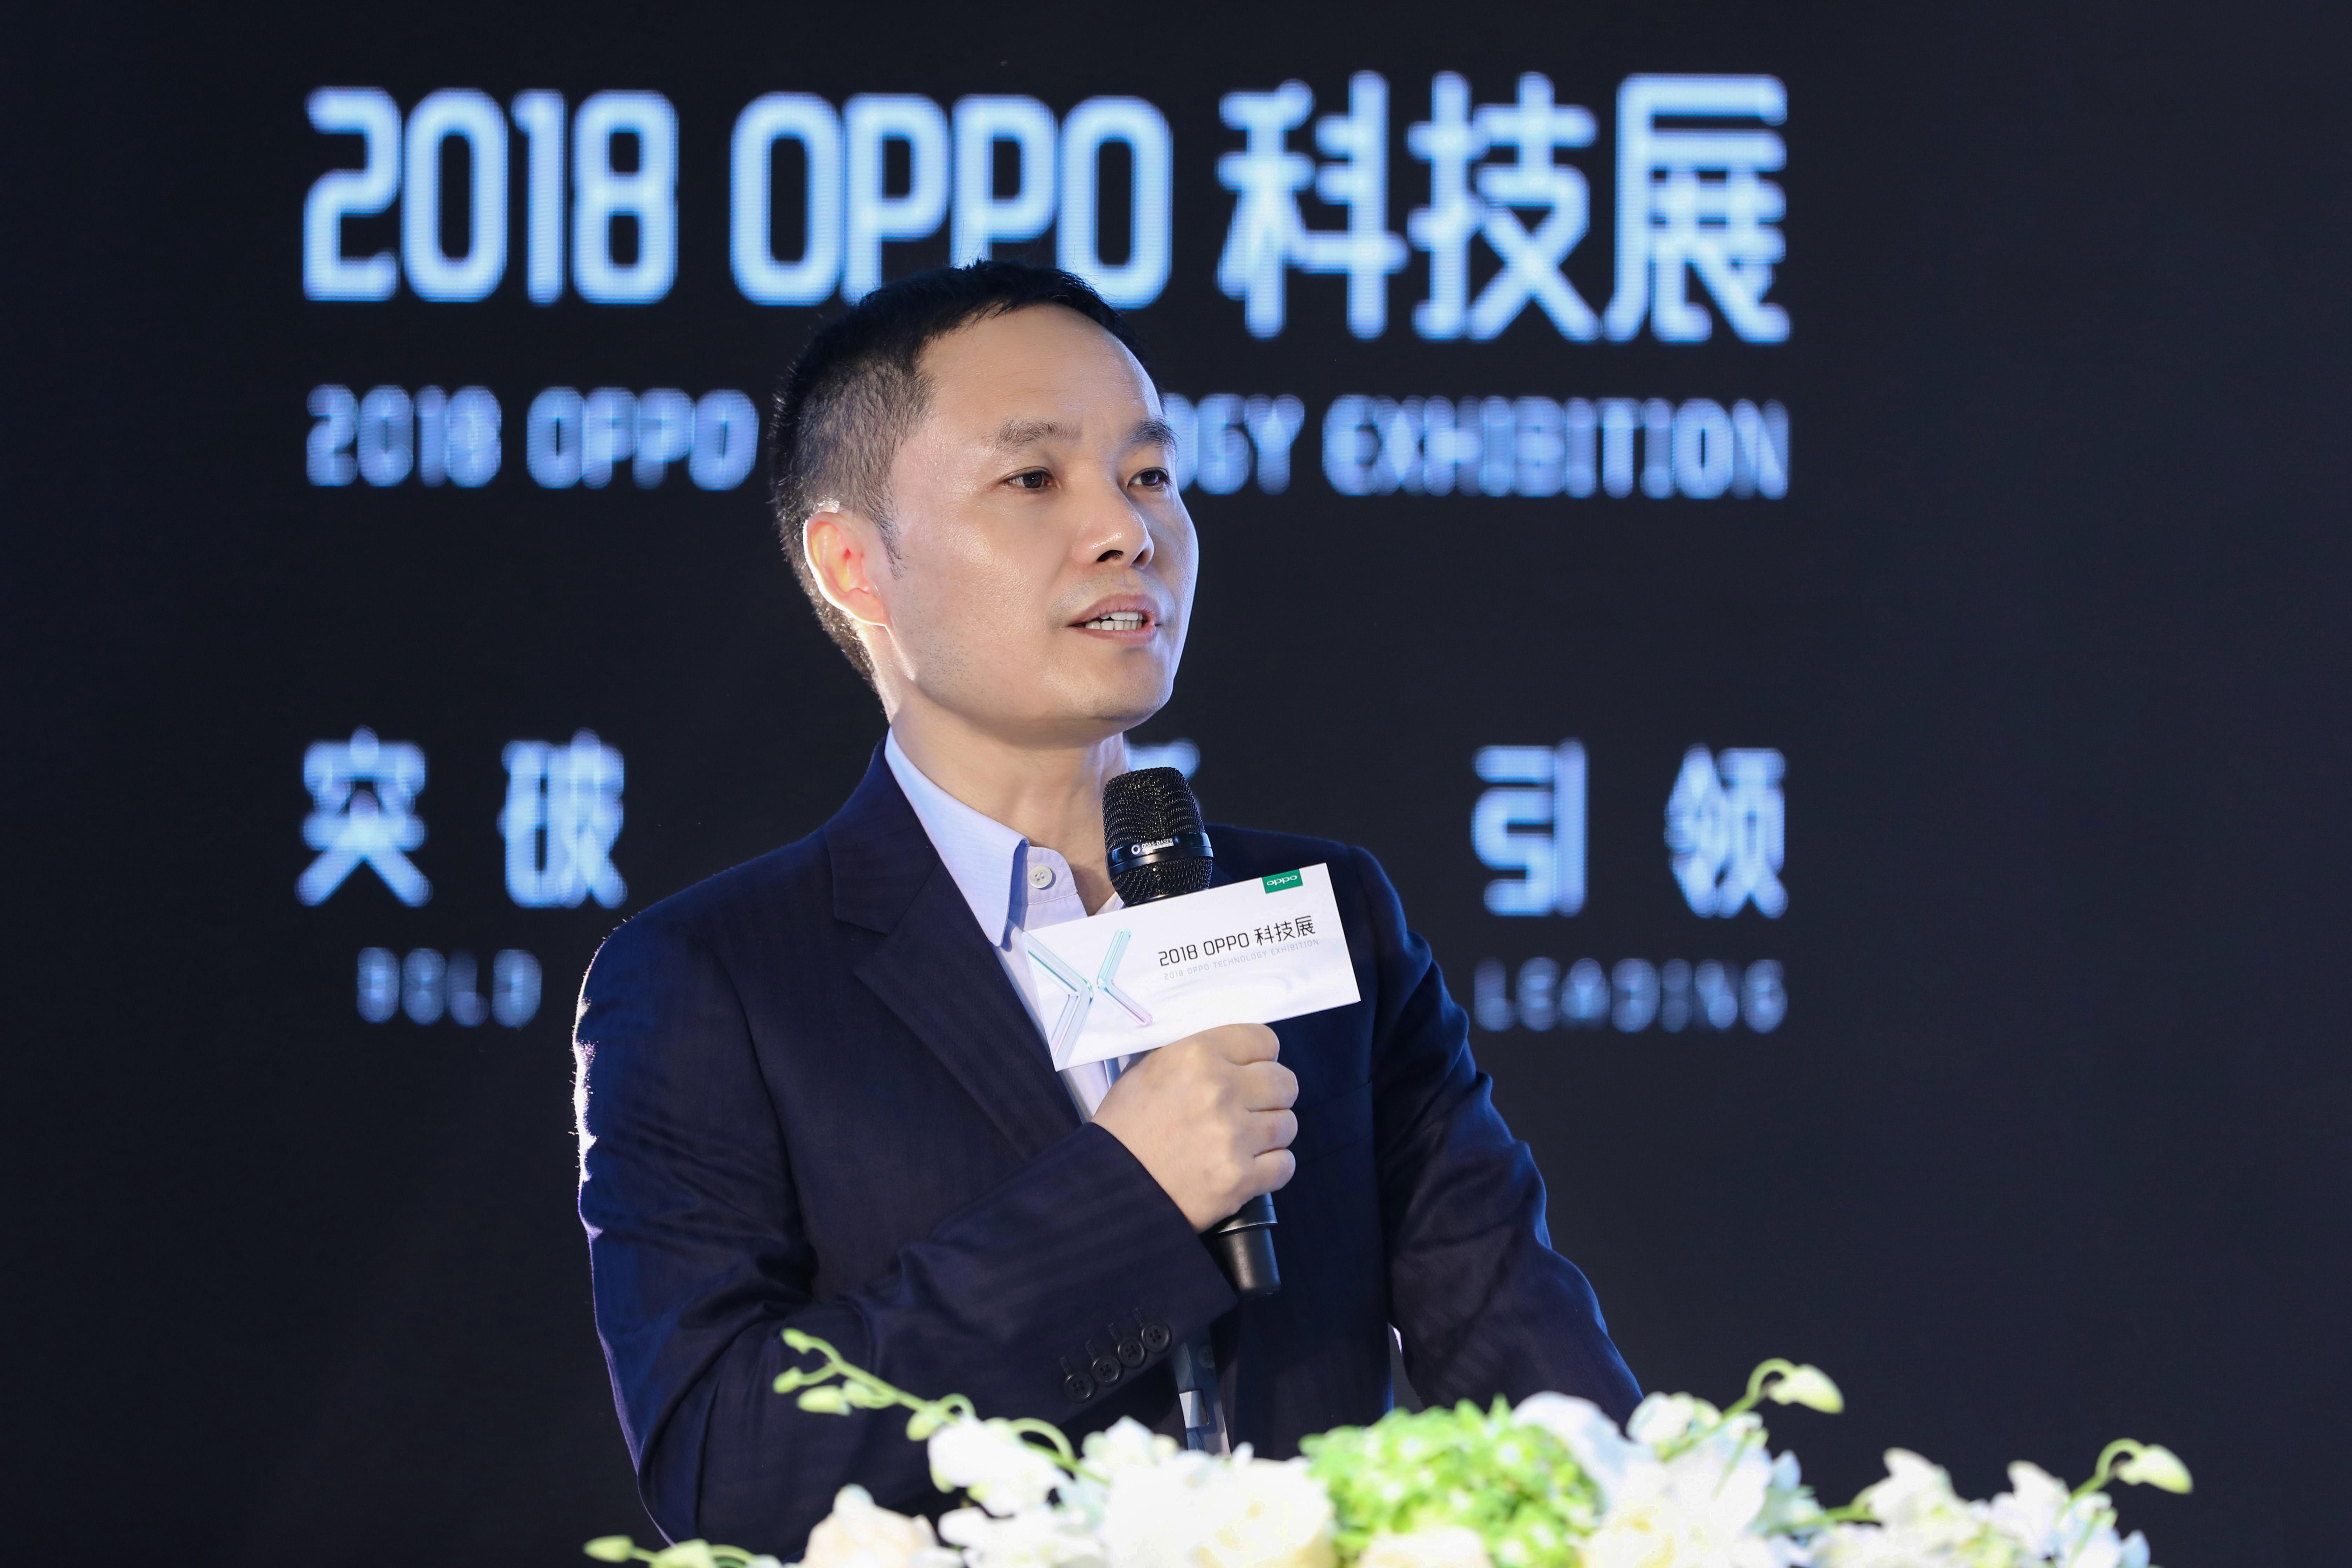 OPPO陈明永:明年研发投入100亿,将推智能手表等移动终端